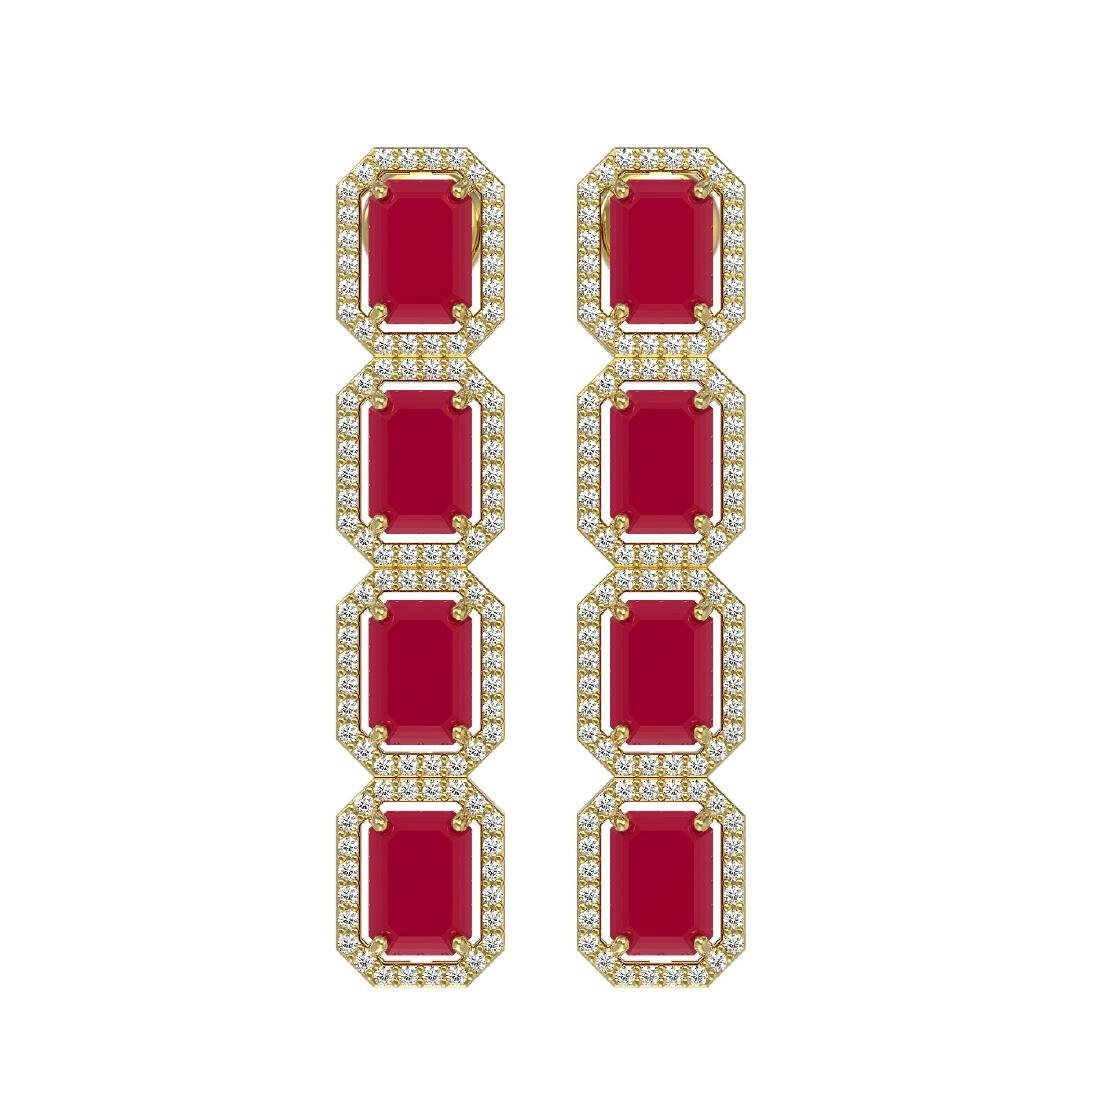 12.33 CTW Ruby & Diamond Halo Earrings 10K Yellow Gold